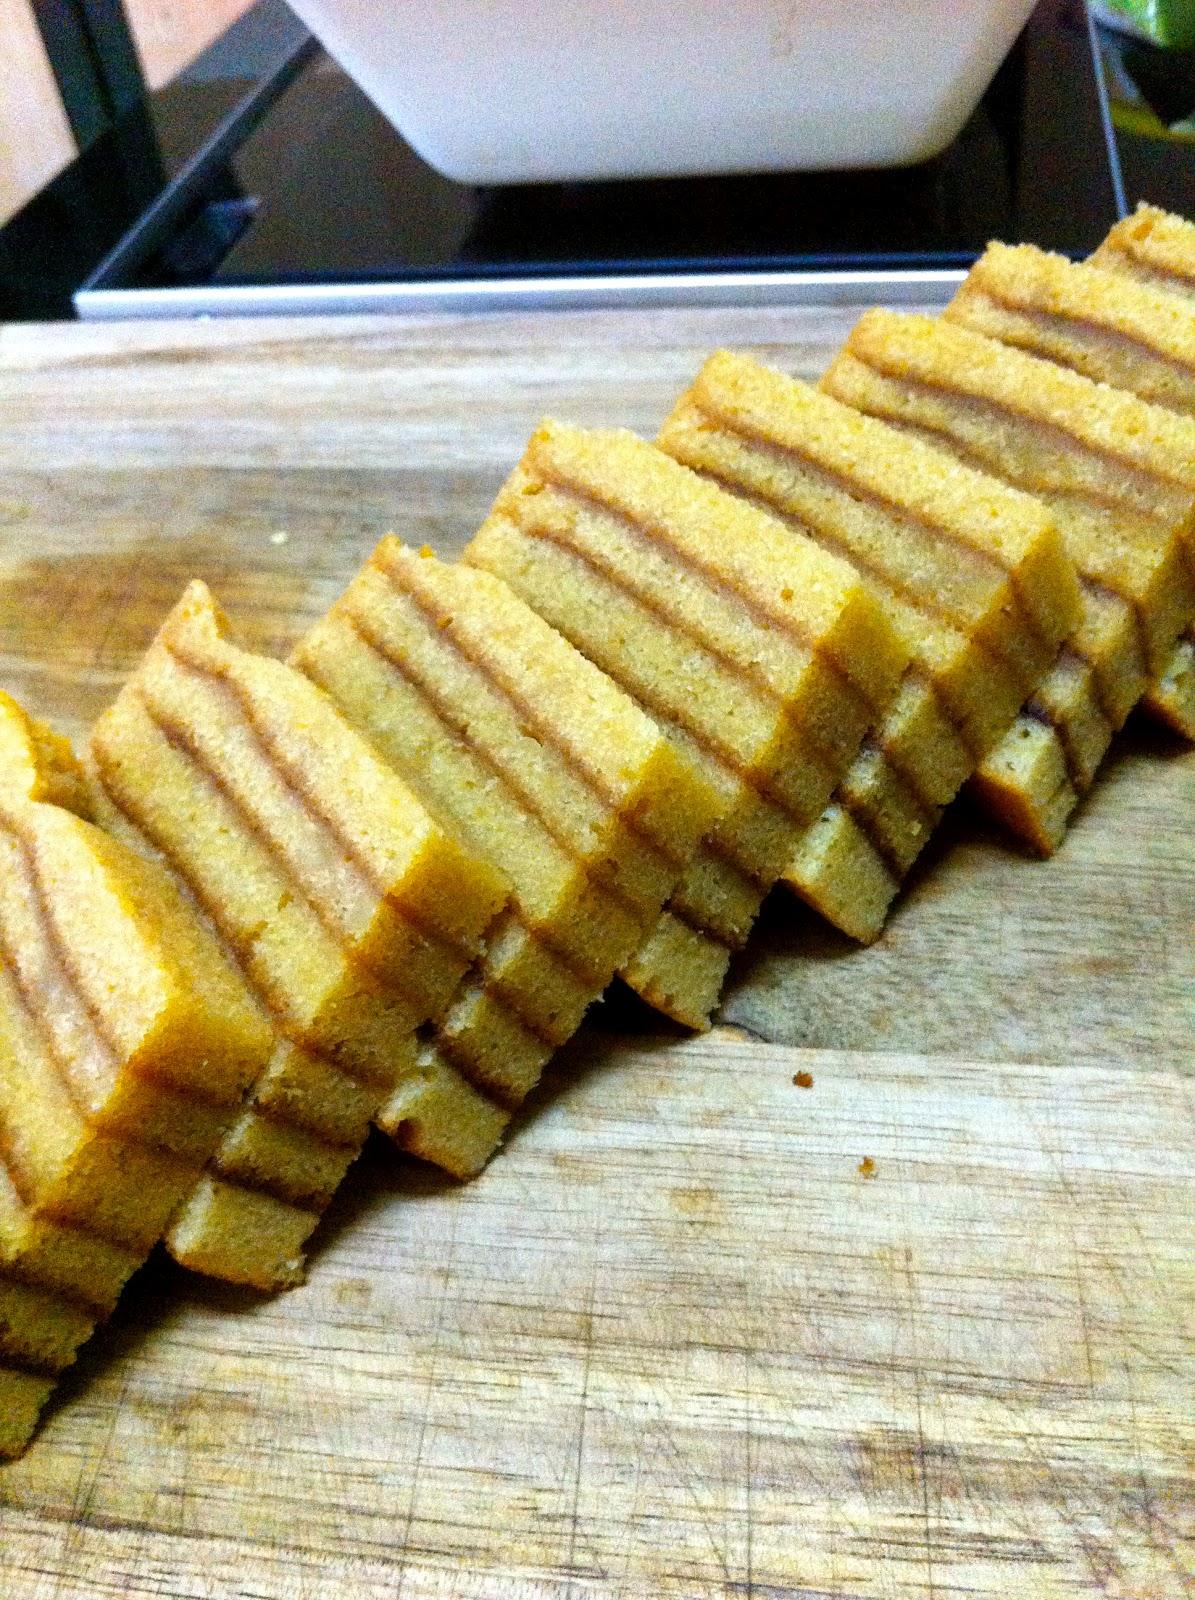 sarawak cake - photo #17